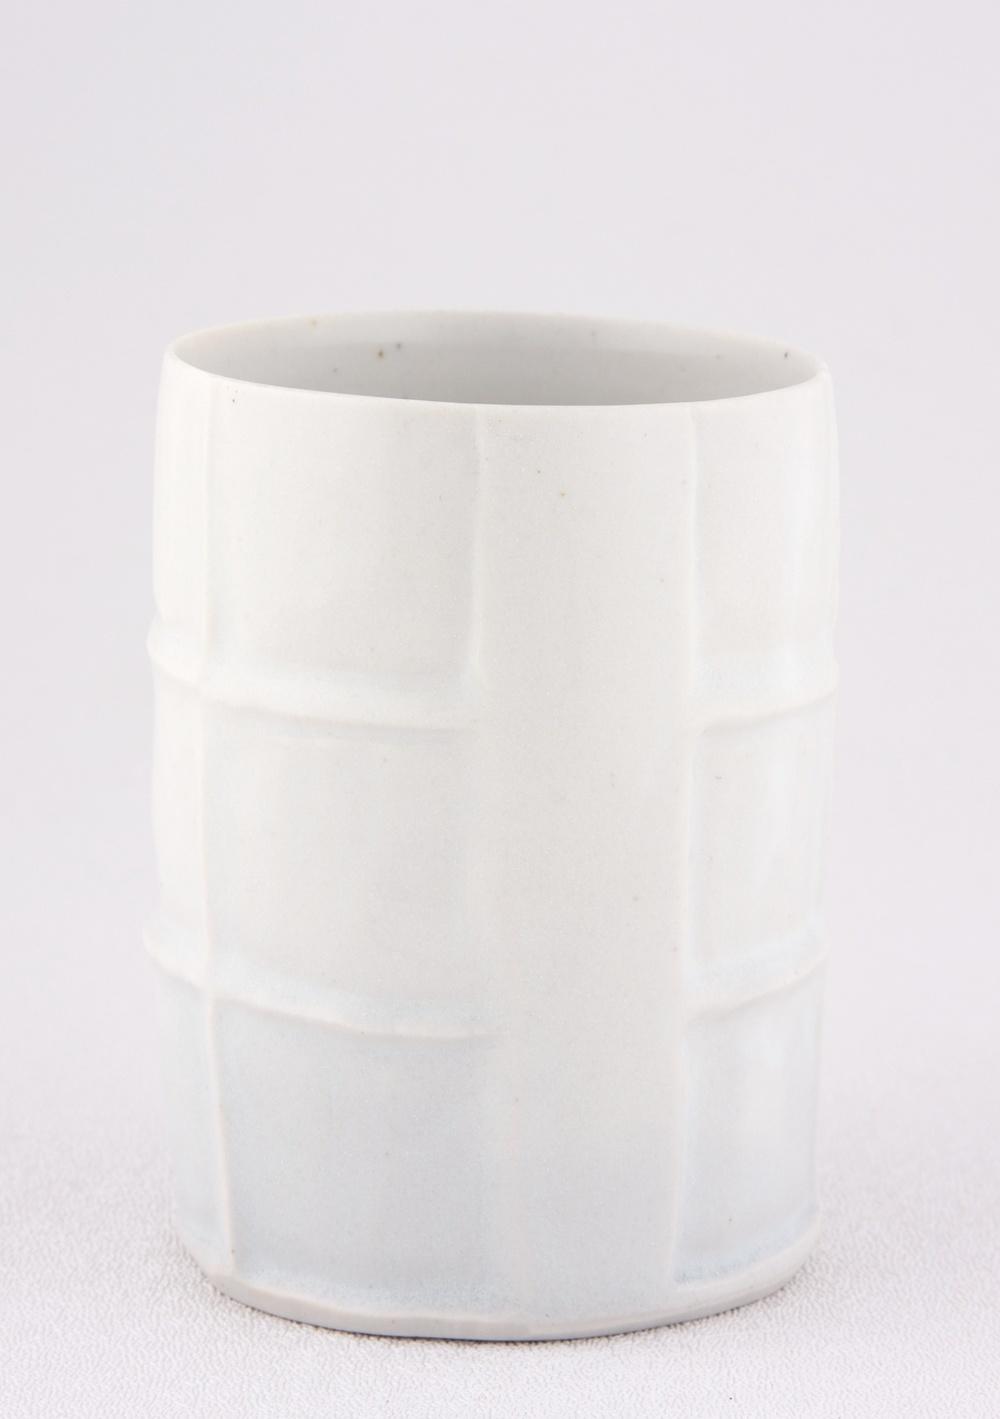 "Shio Kusaka Untitled (cup) 2009 Porcelain 3 5/8"" x 2 3/4"" x 2 3/4"" SK017"